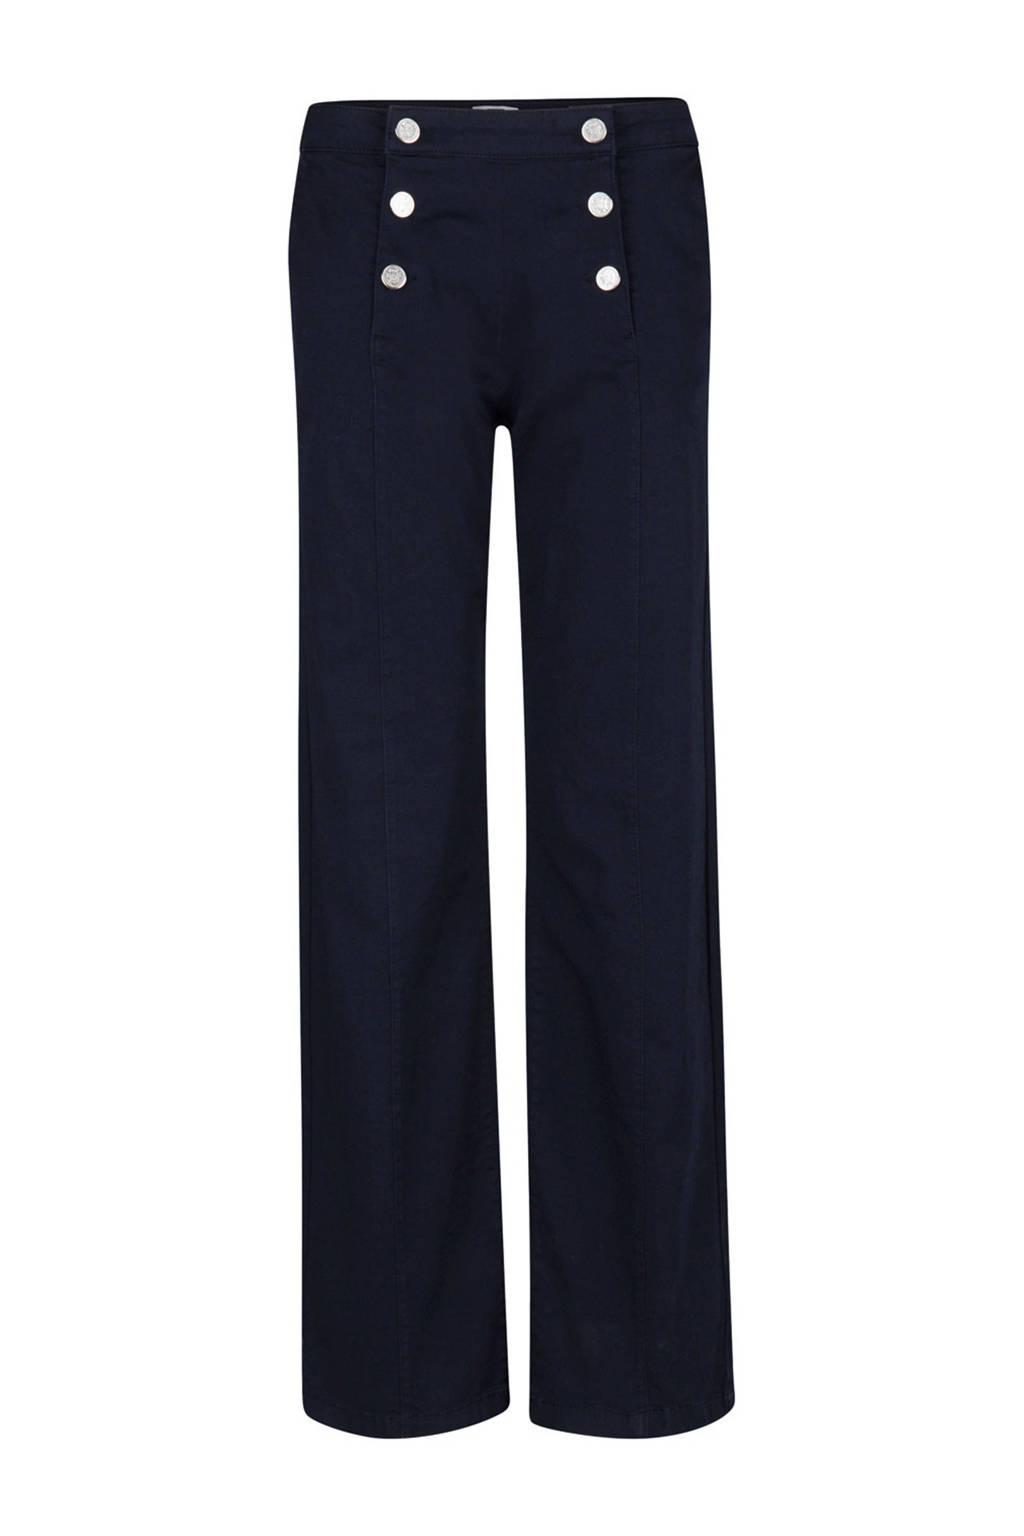 WE Fashion loose fit broek blauw, Donkerblauw